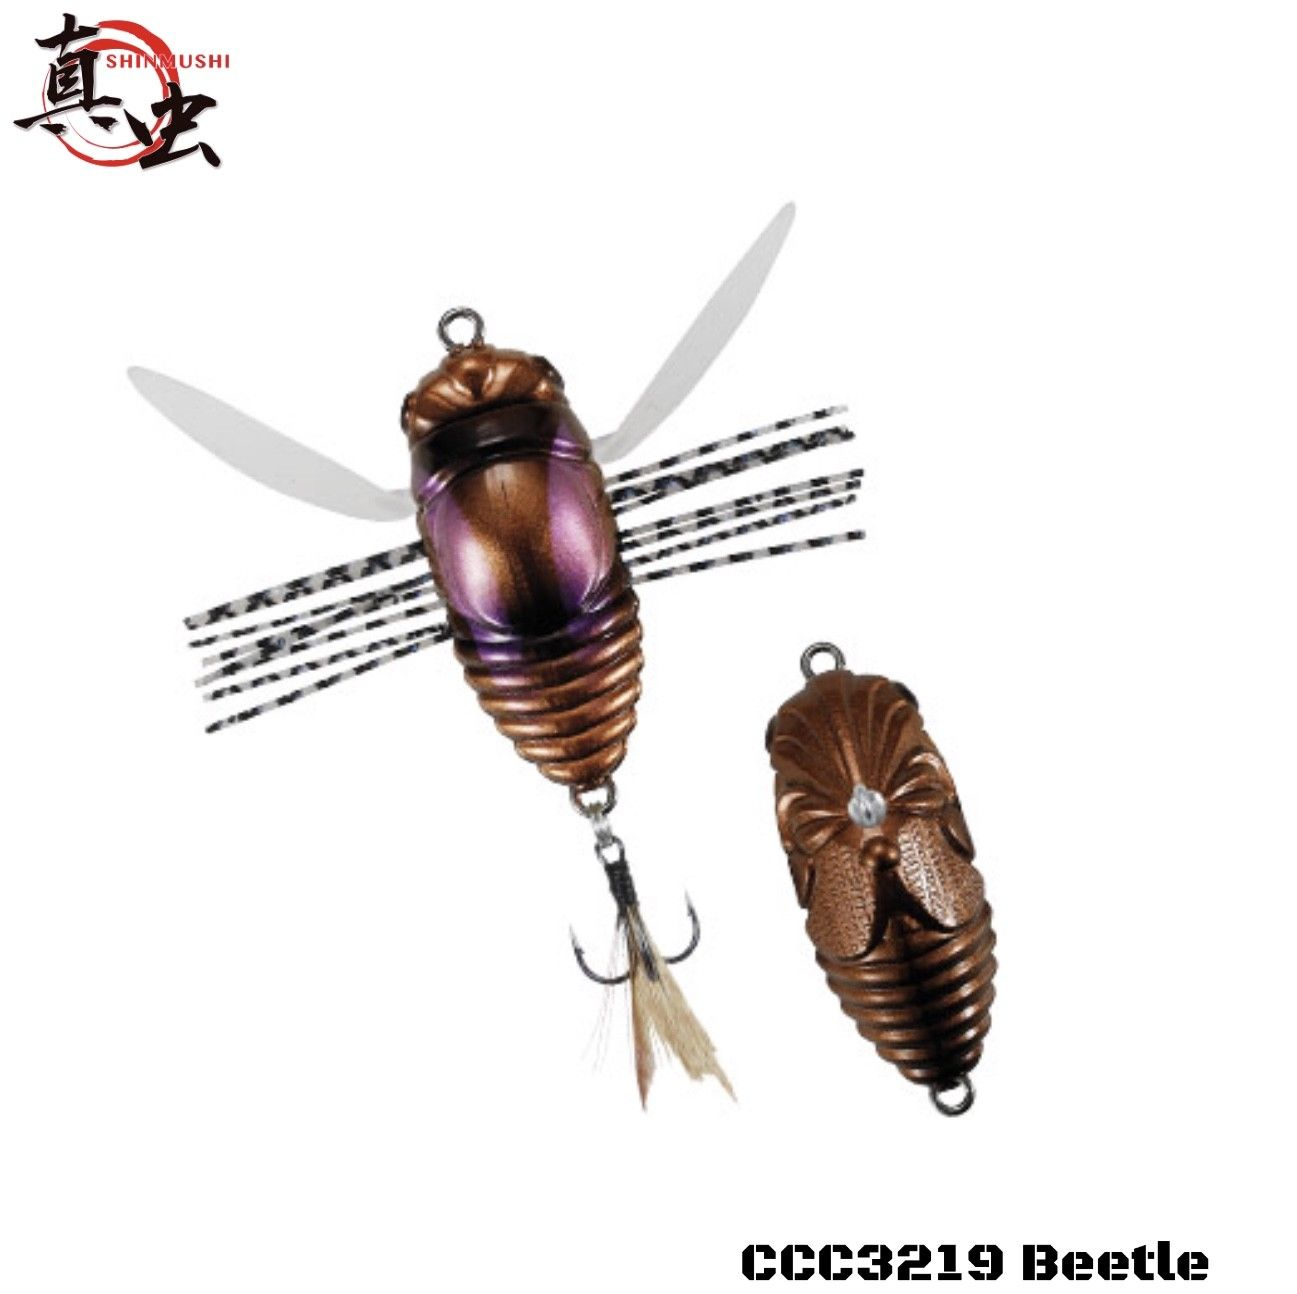 2555 Duo Realis Ko Shinmushi Cicada Schwimmend Köder CCC3202